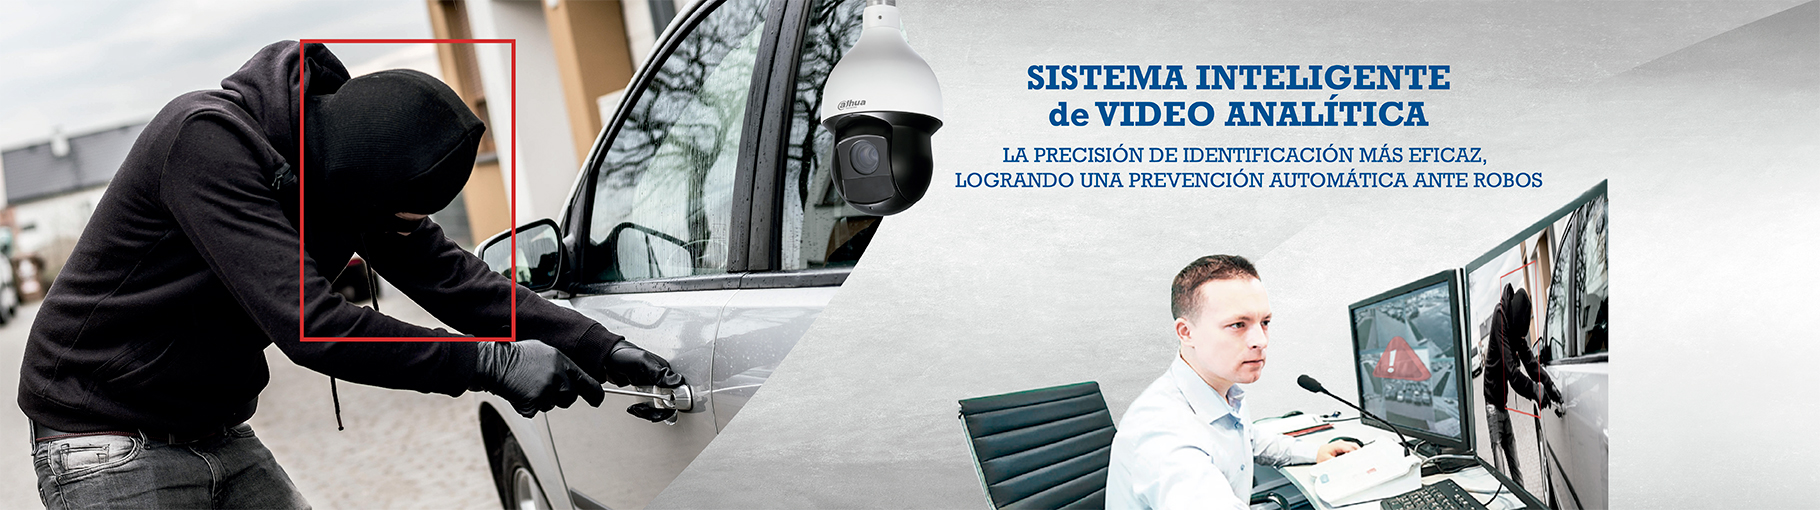 banner-de-videoanalitica